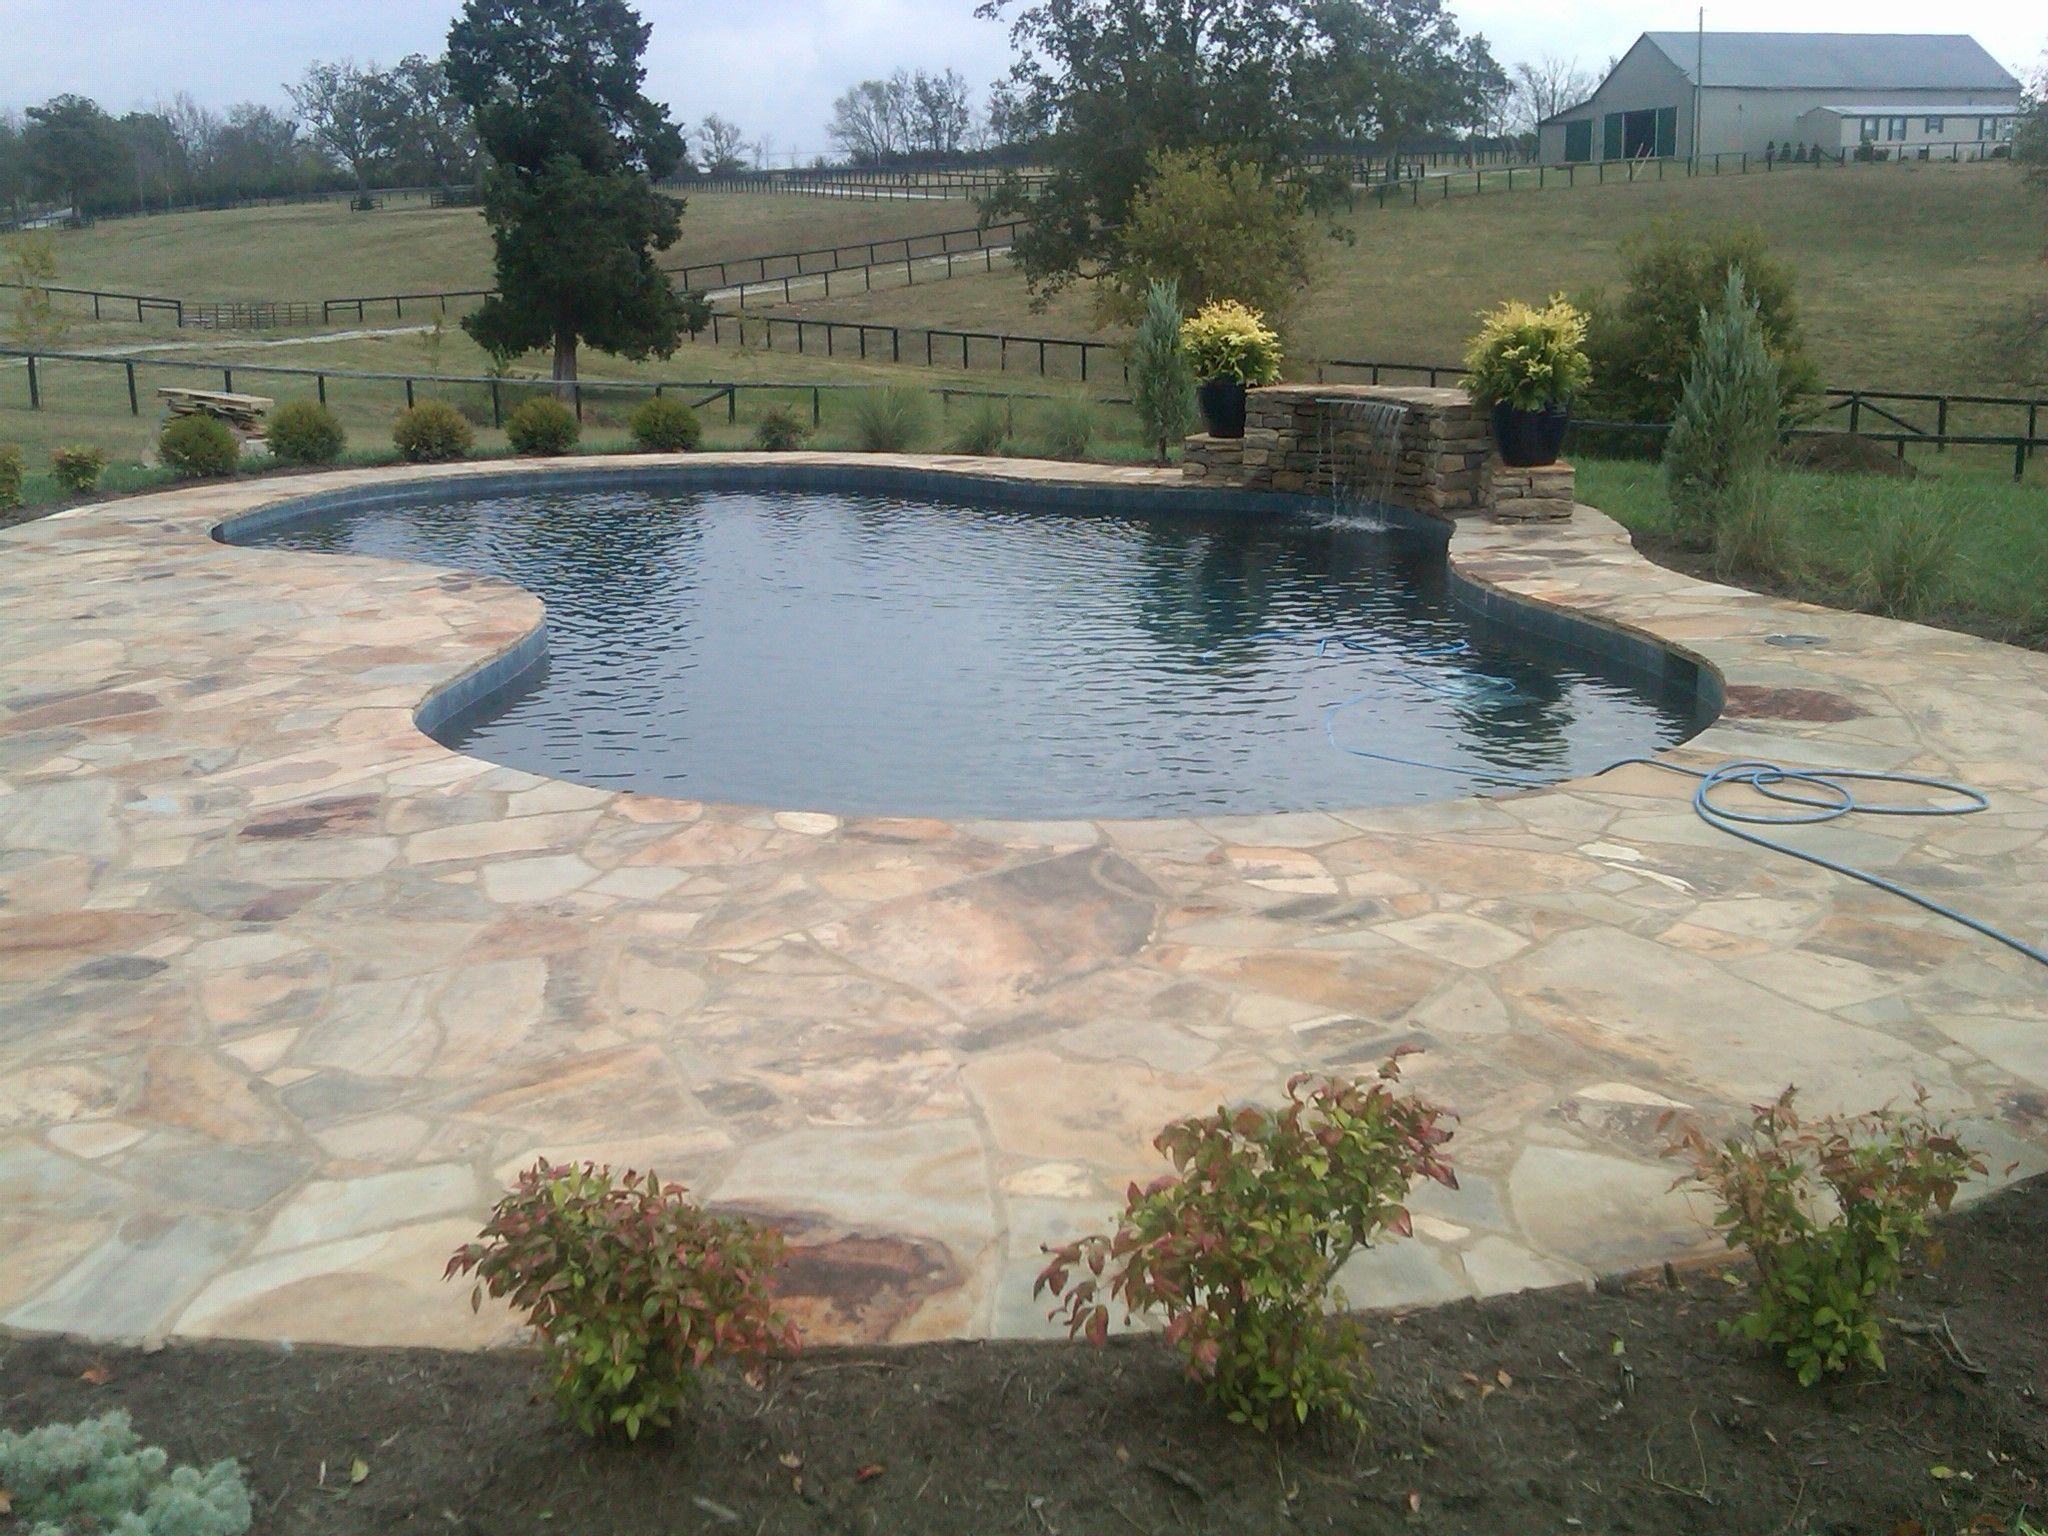 Backyard Fun Pools Inc Nicholasville Ky - House Backyards